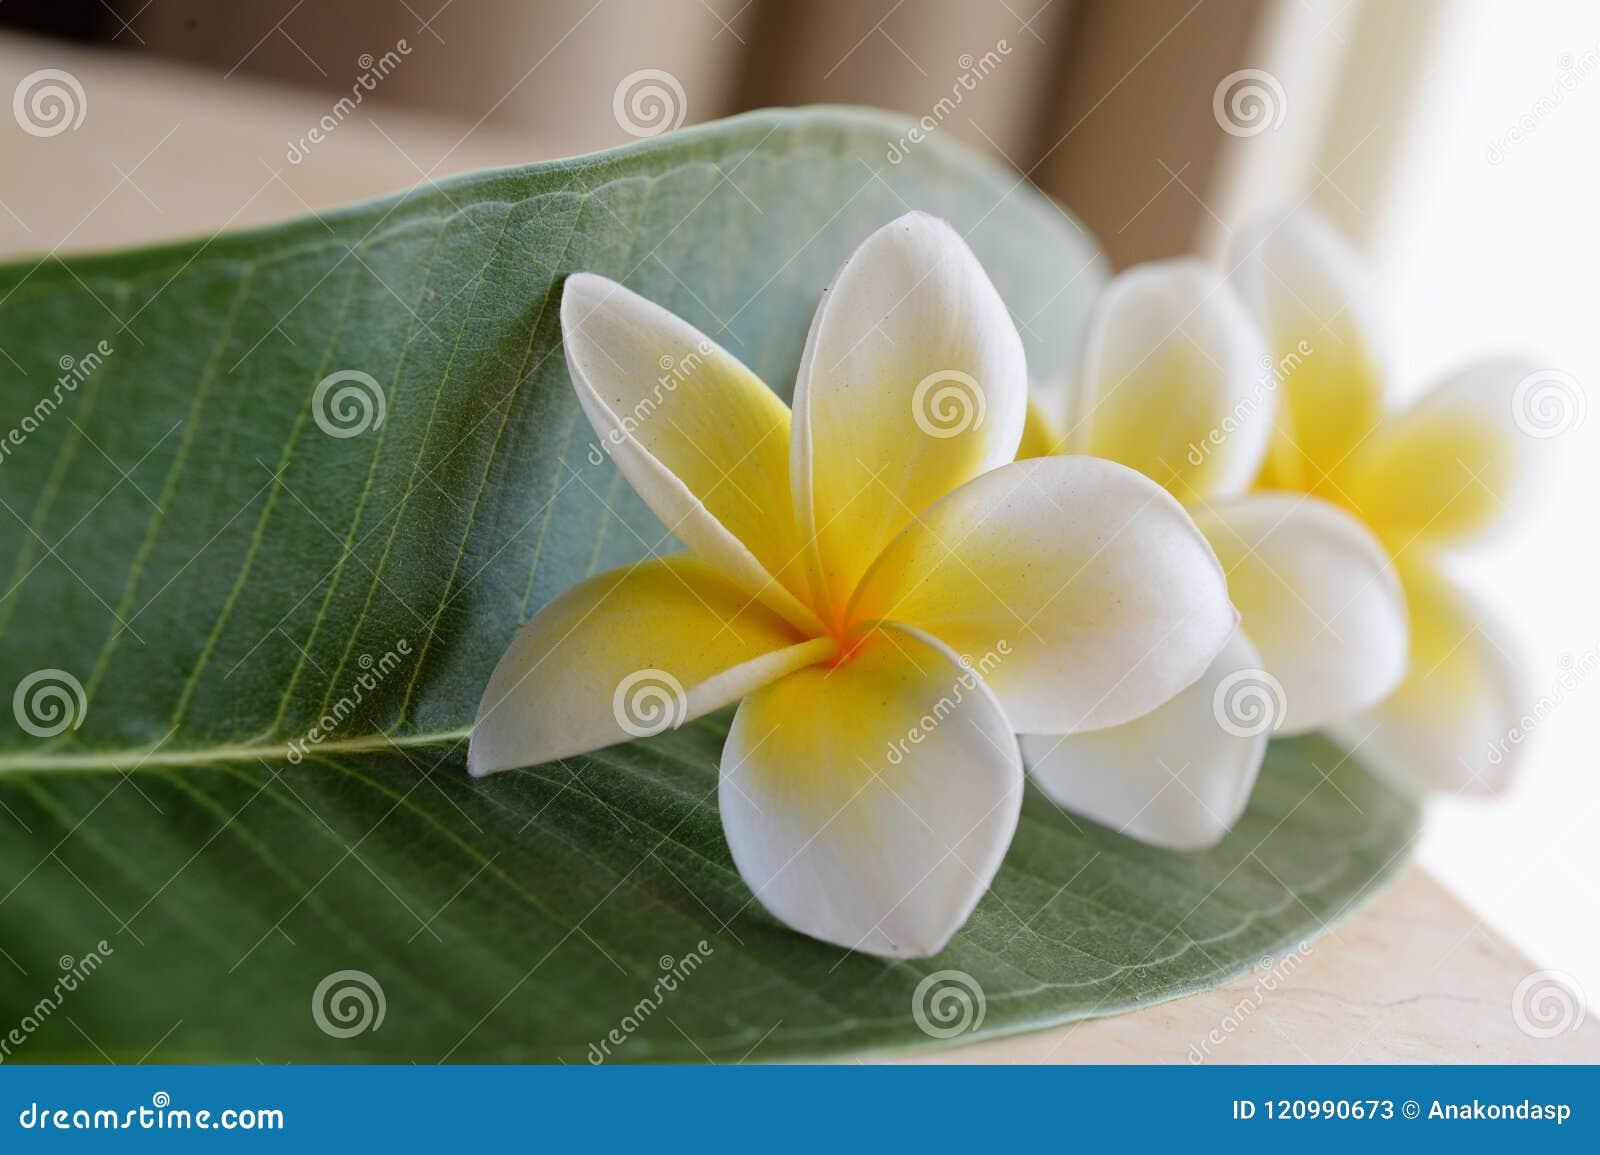 Frangipani tropical flowers plumeria flowers fresh stock image frangipani tropical flowers plumeria flowers fresh izmirmasajfo